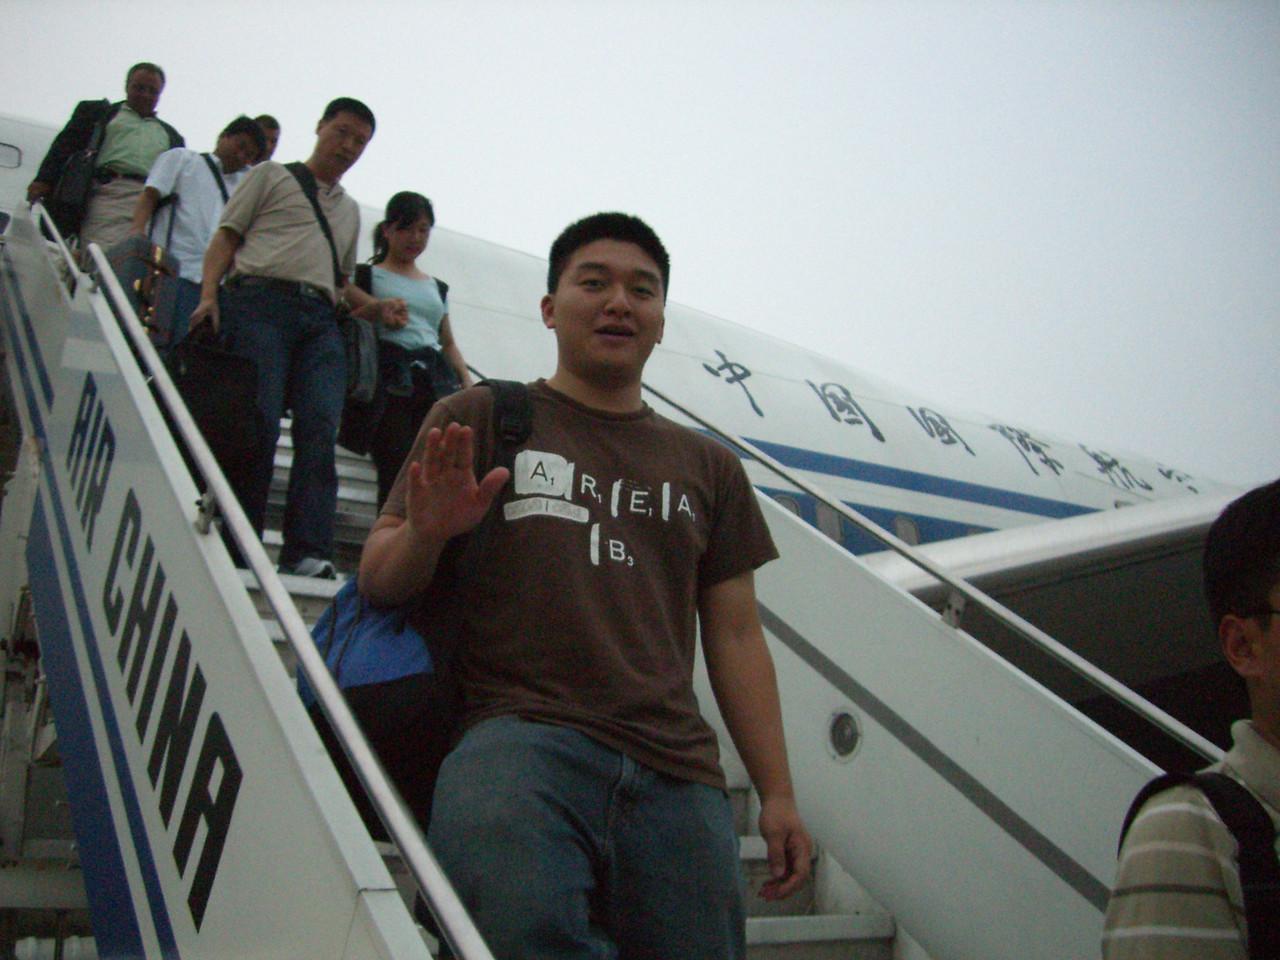 2006 07 13 Thu - Dan Tung deplaning